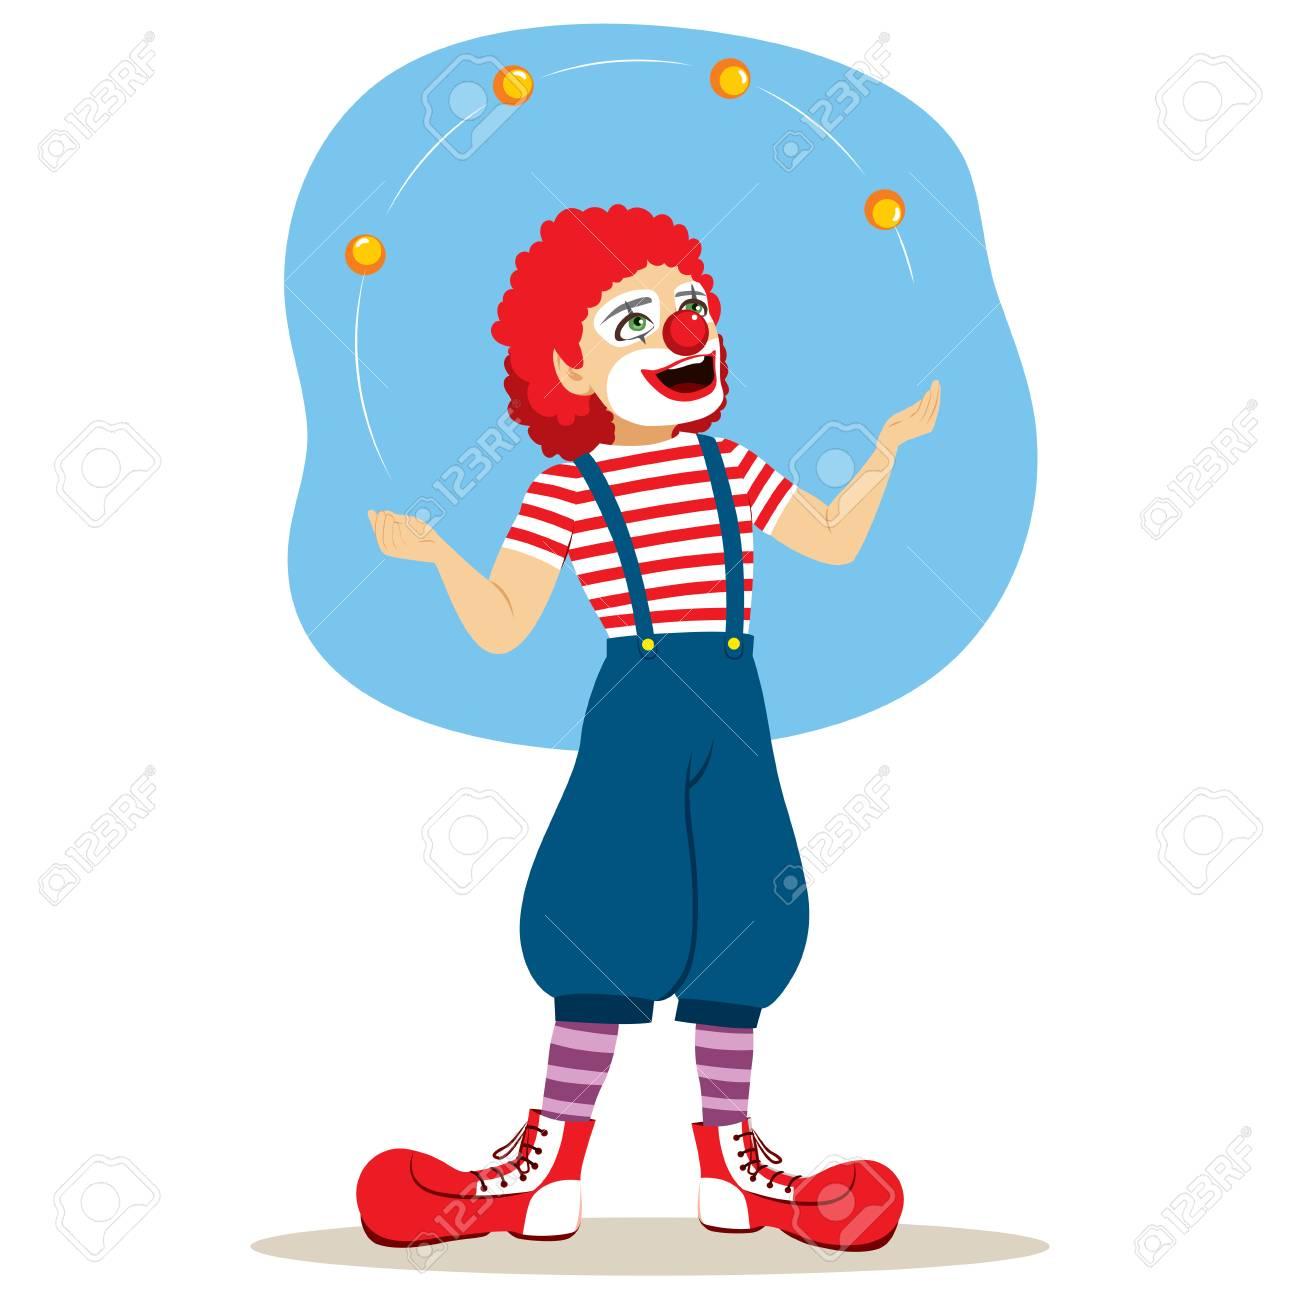 Girl and clown juggling balls illustration.